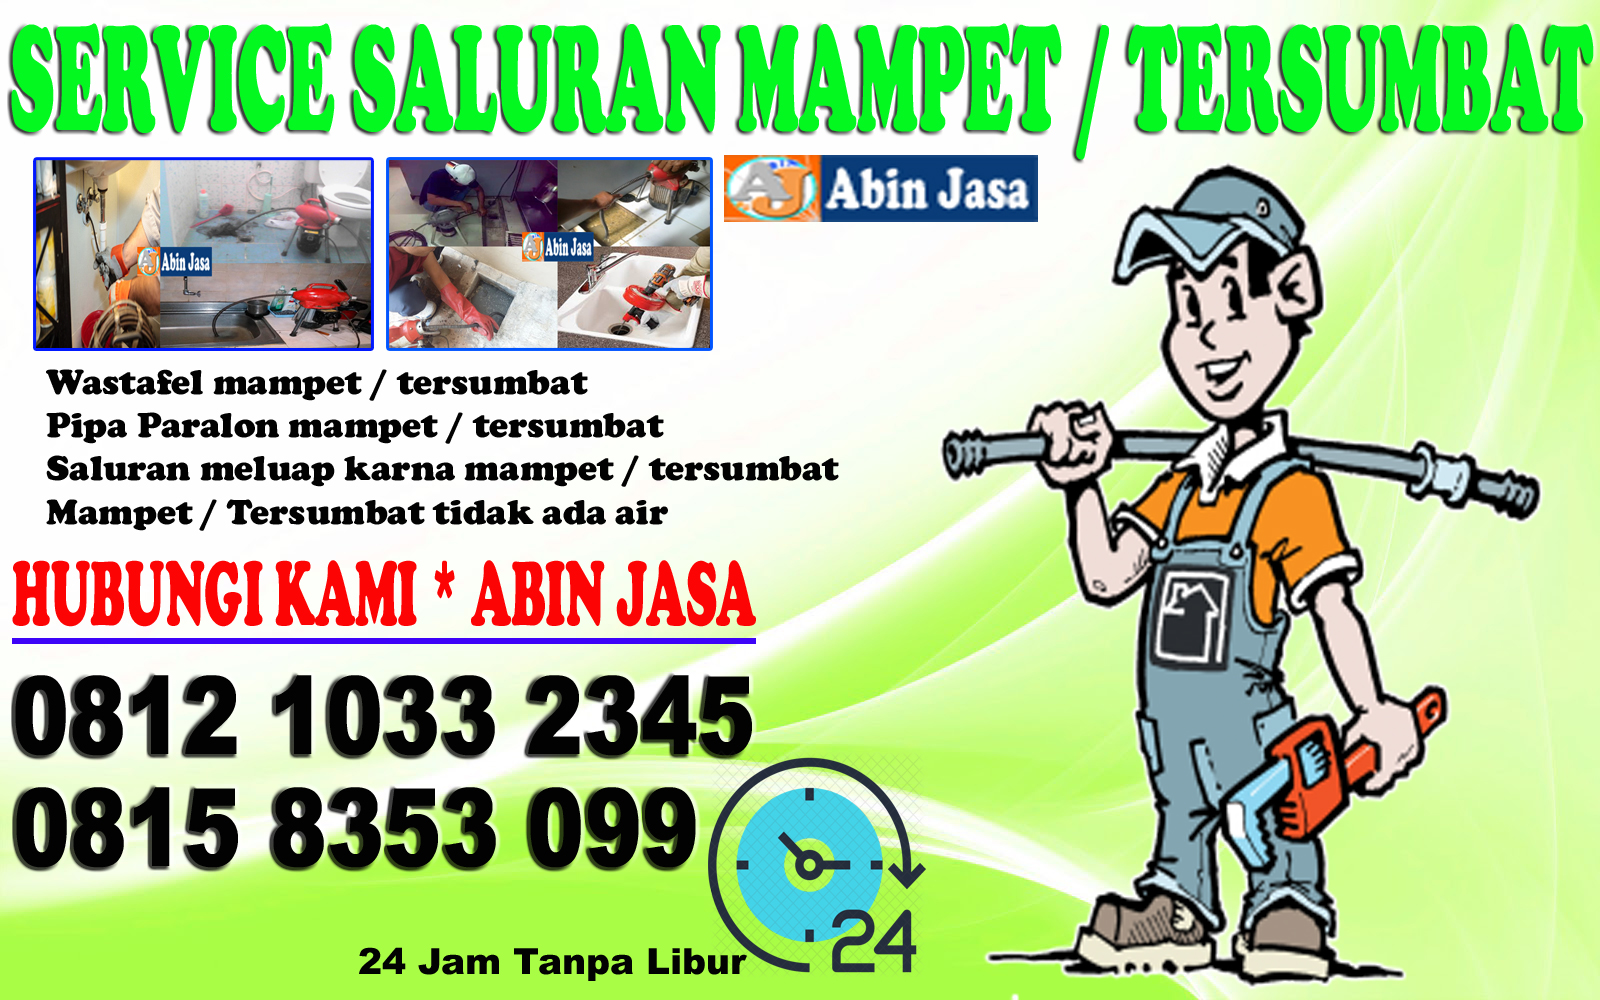 Tukang Ledeng gondangdia, Jasa Pelancar Saluran Mampet 08158353099